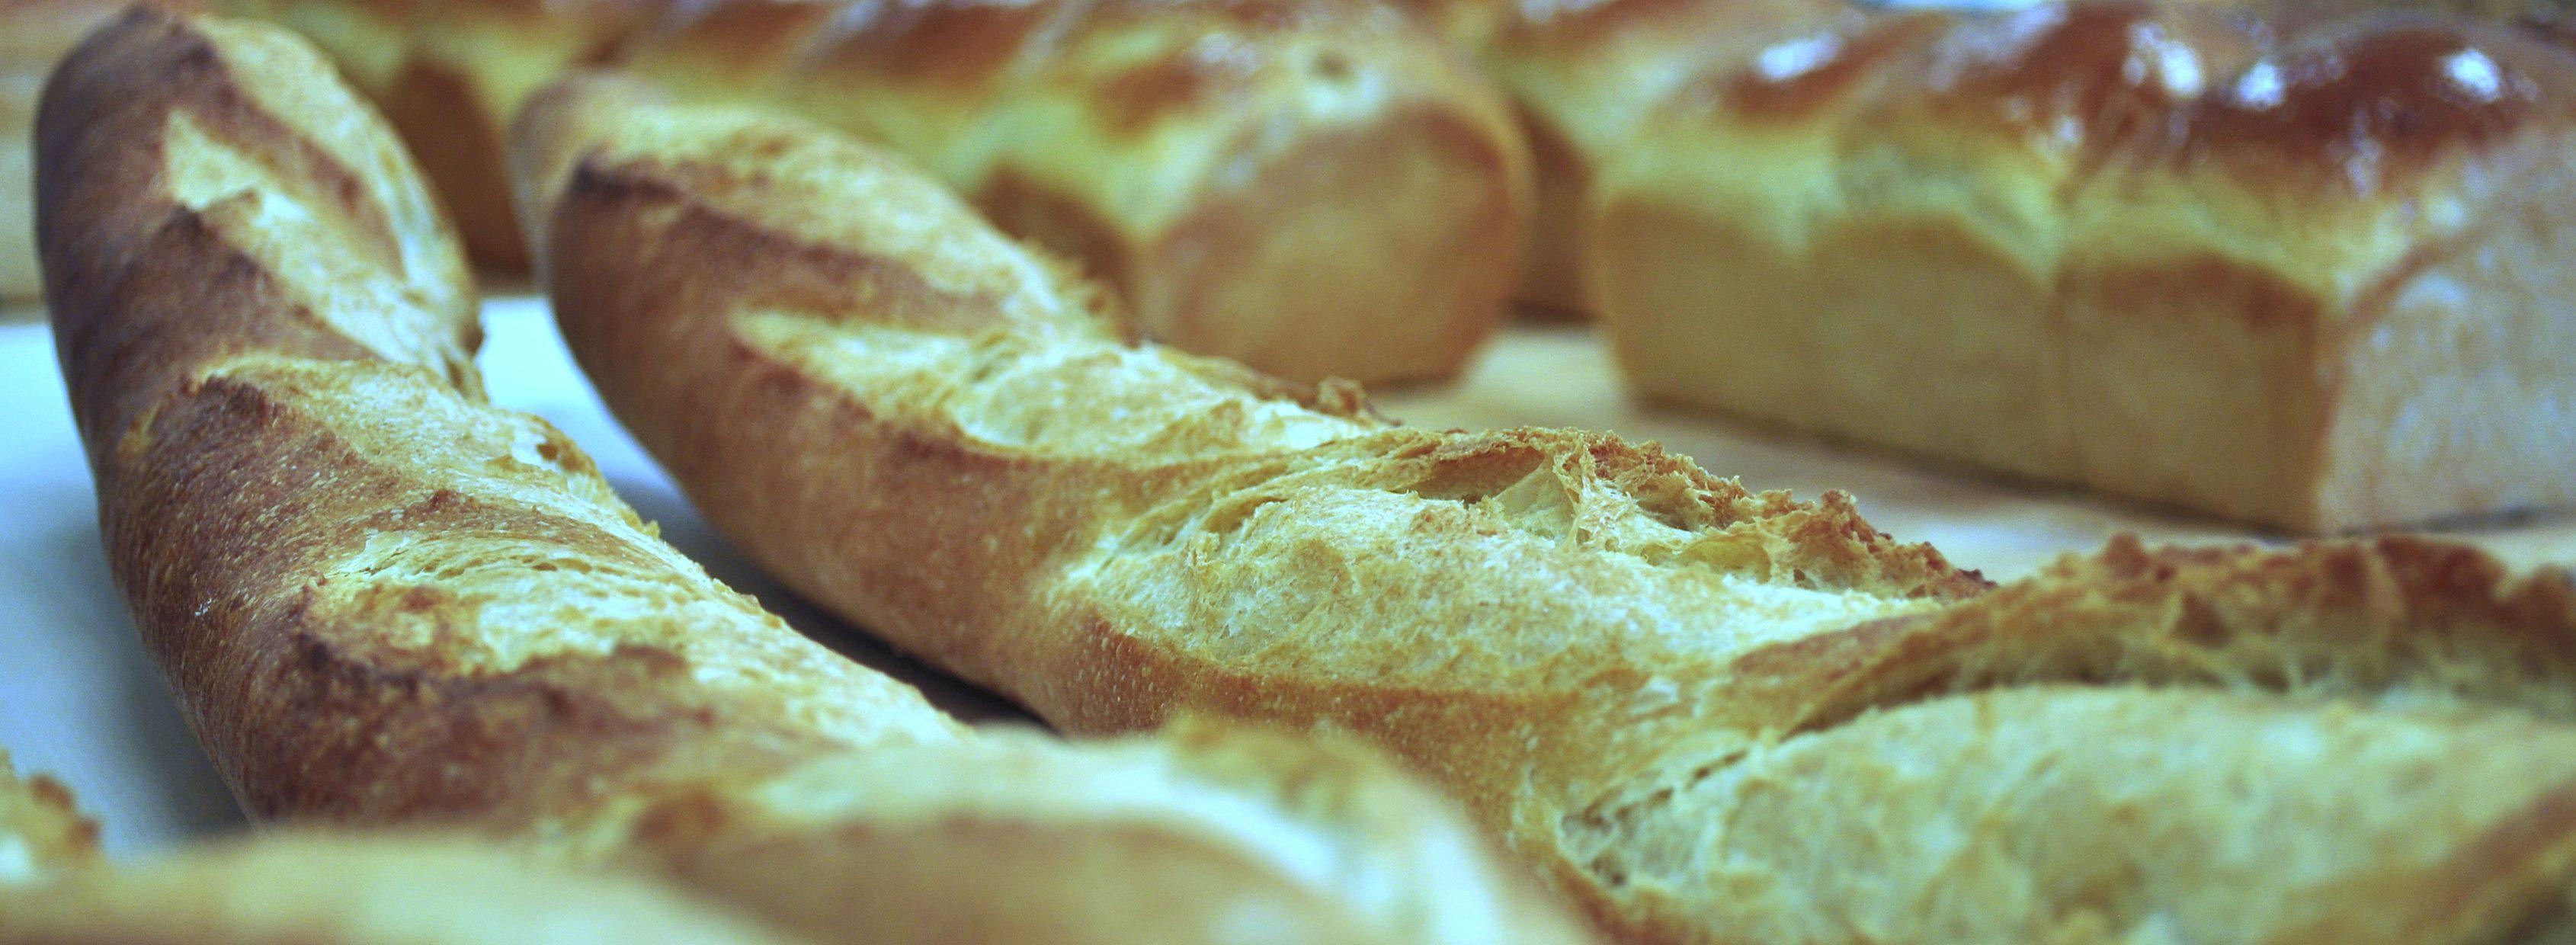 Gil's Fine Artisan Breads Ridgeland MS